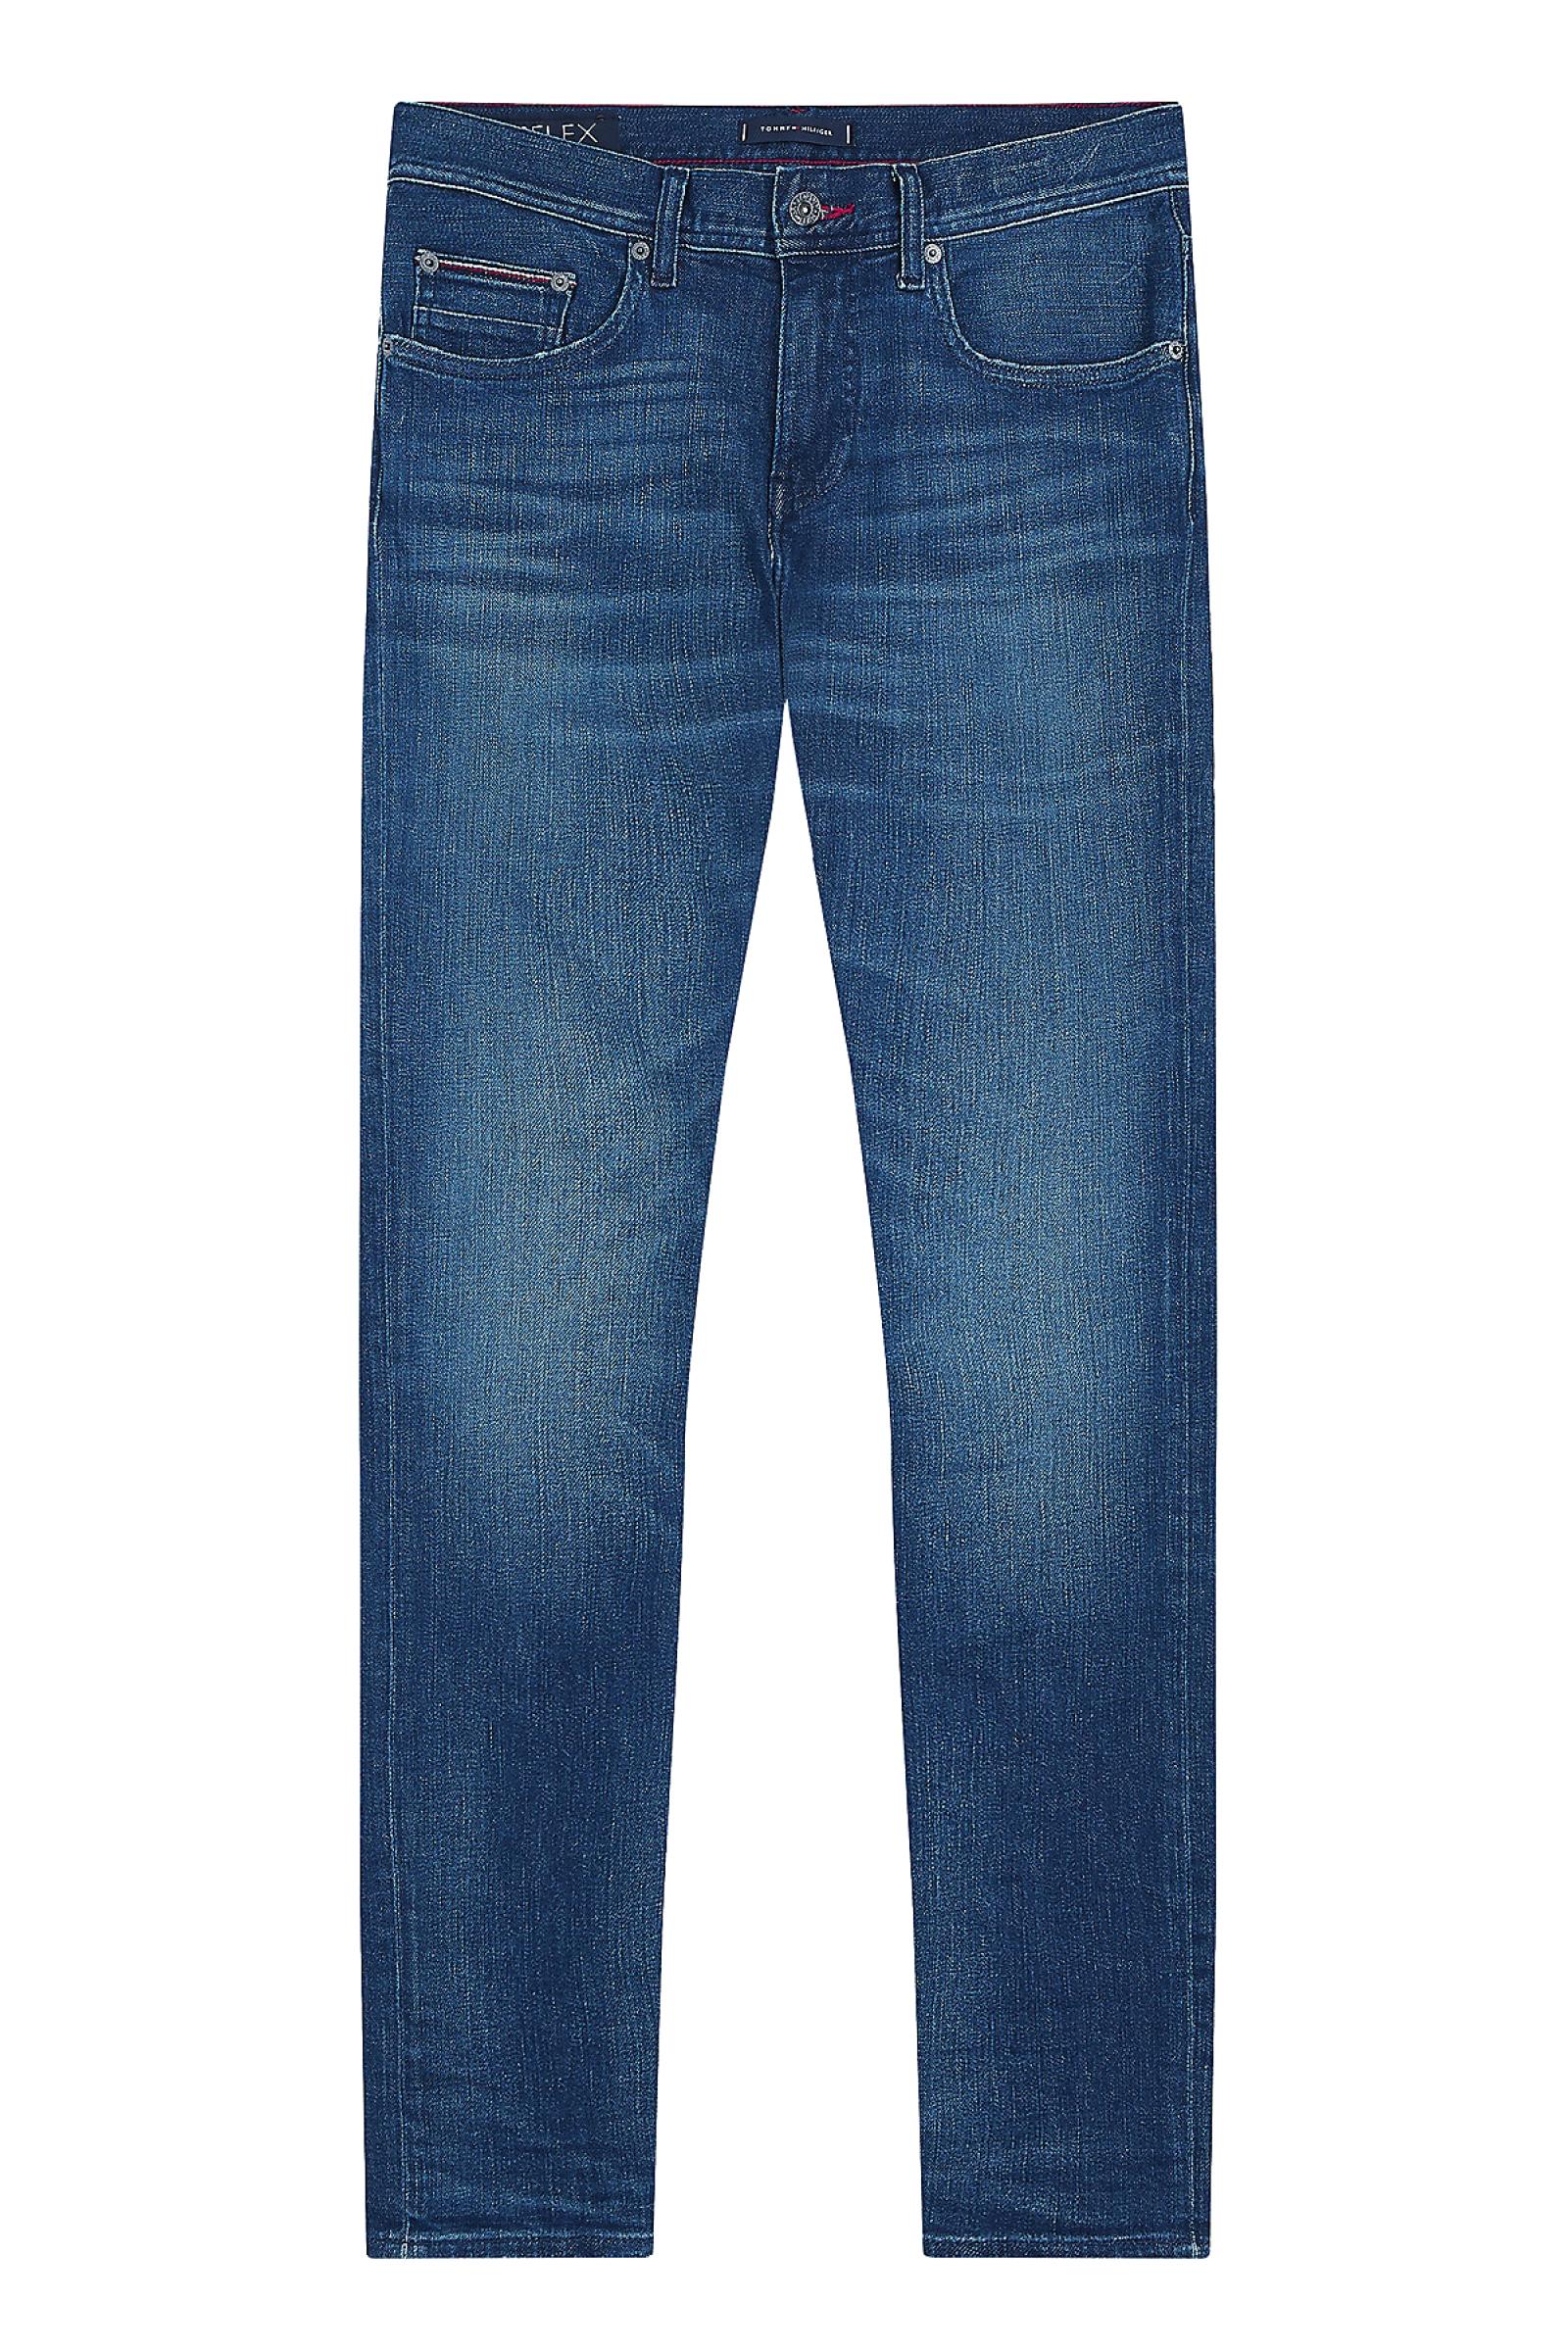 TOMMY HILFIGER Jeans Man TOMMY HILFIGER | Jeans | MW0MW159621BM